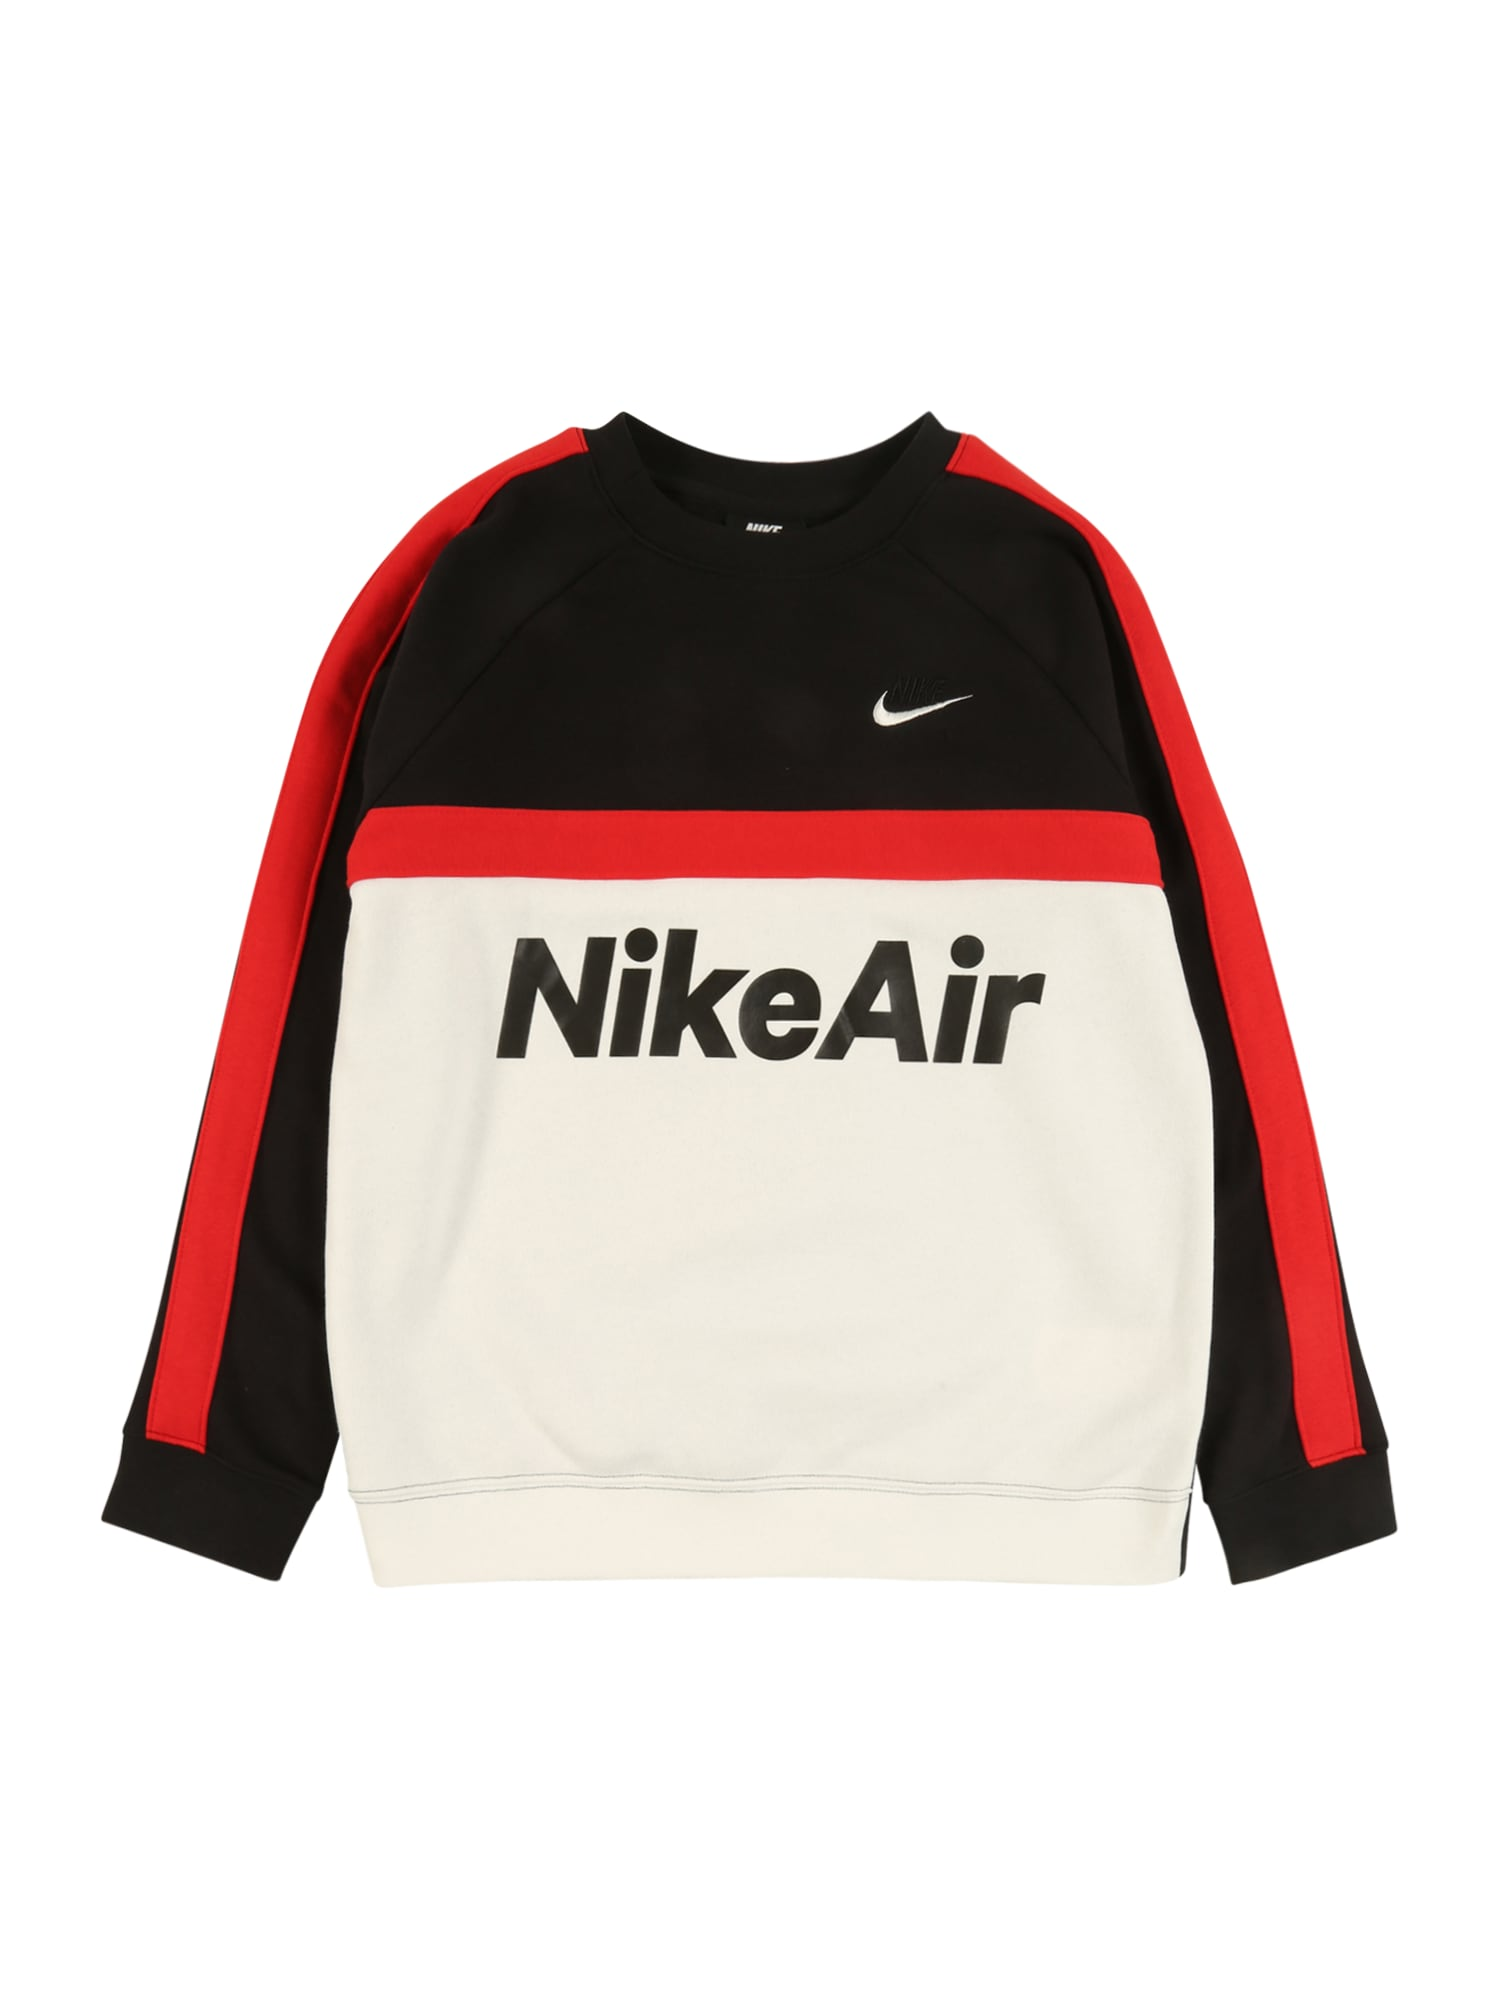 Nike Sportswear Tréning póló  fekete / fehér / piros